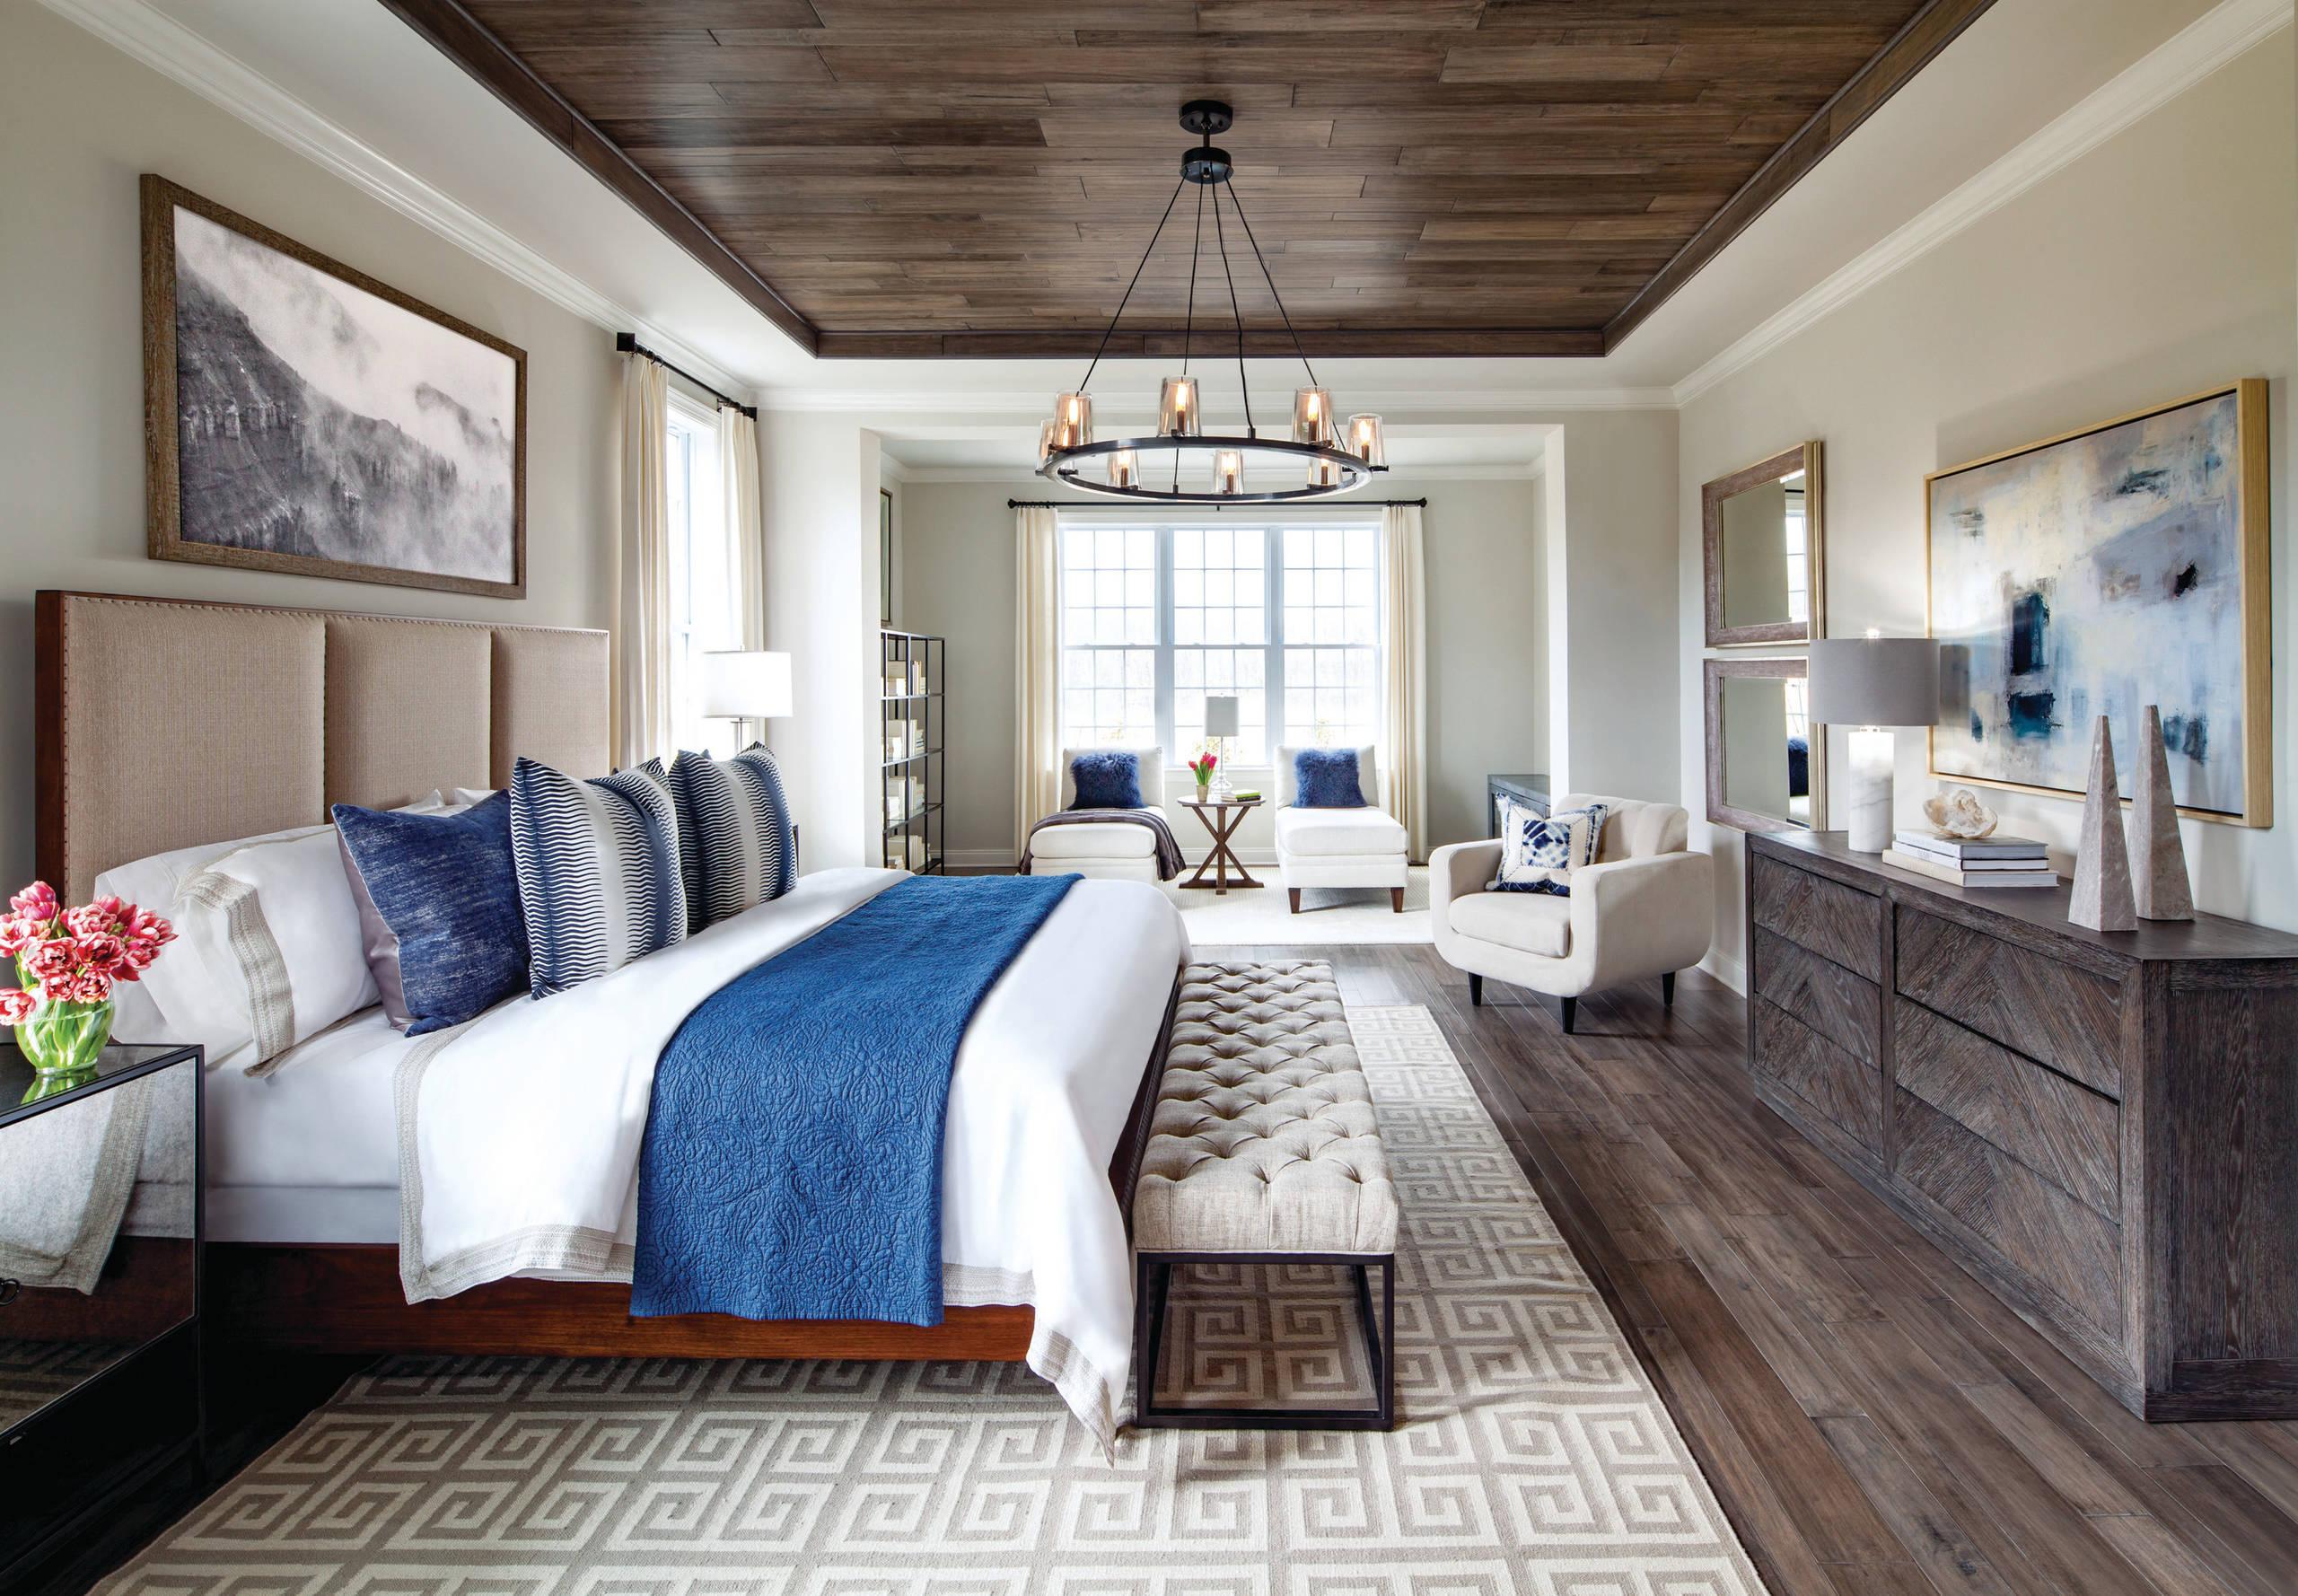 75 Beautiful Transitional Dark Wood Floor Bedroom Pictures Ideas July 2021 Houzz